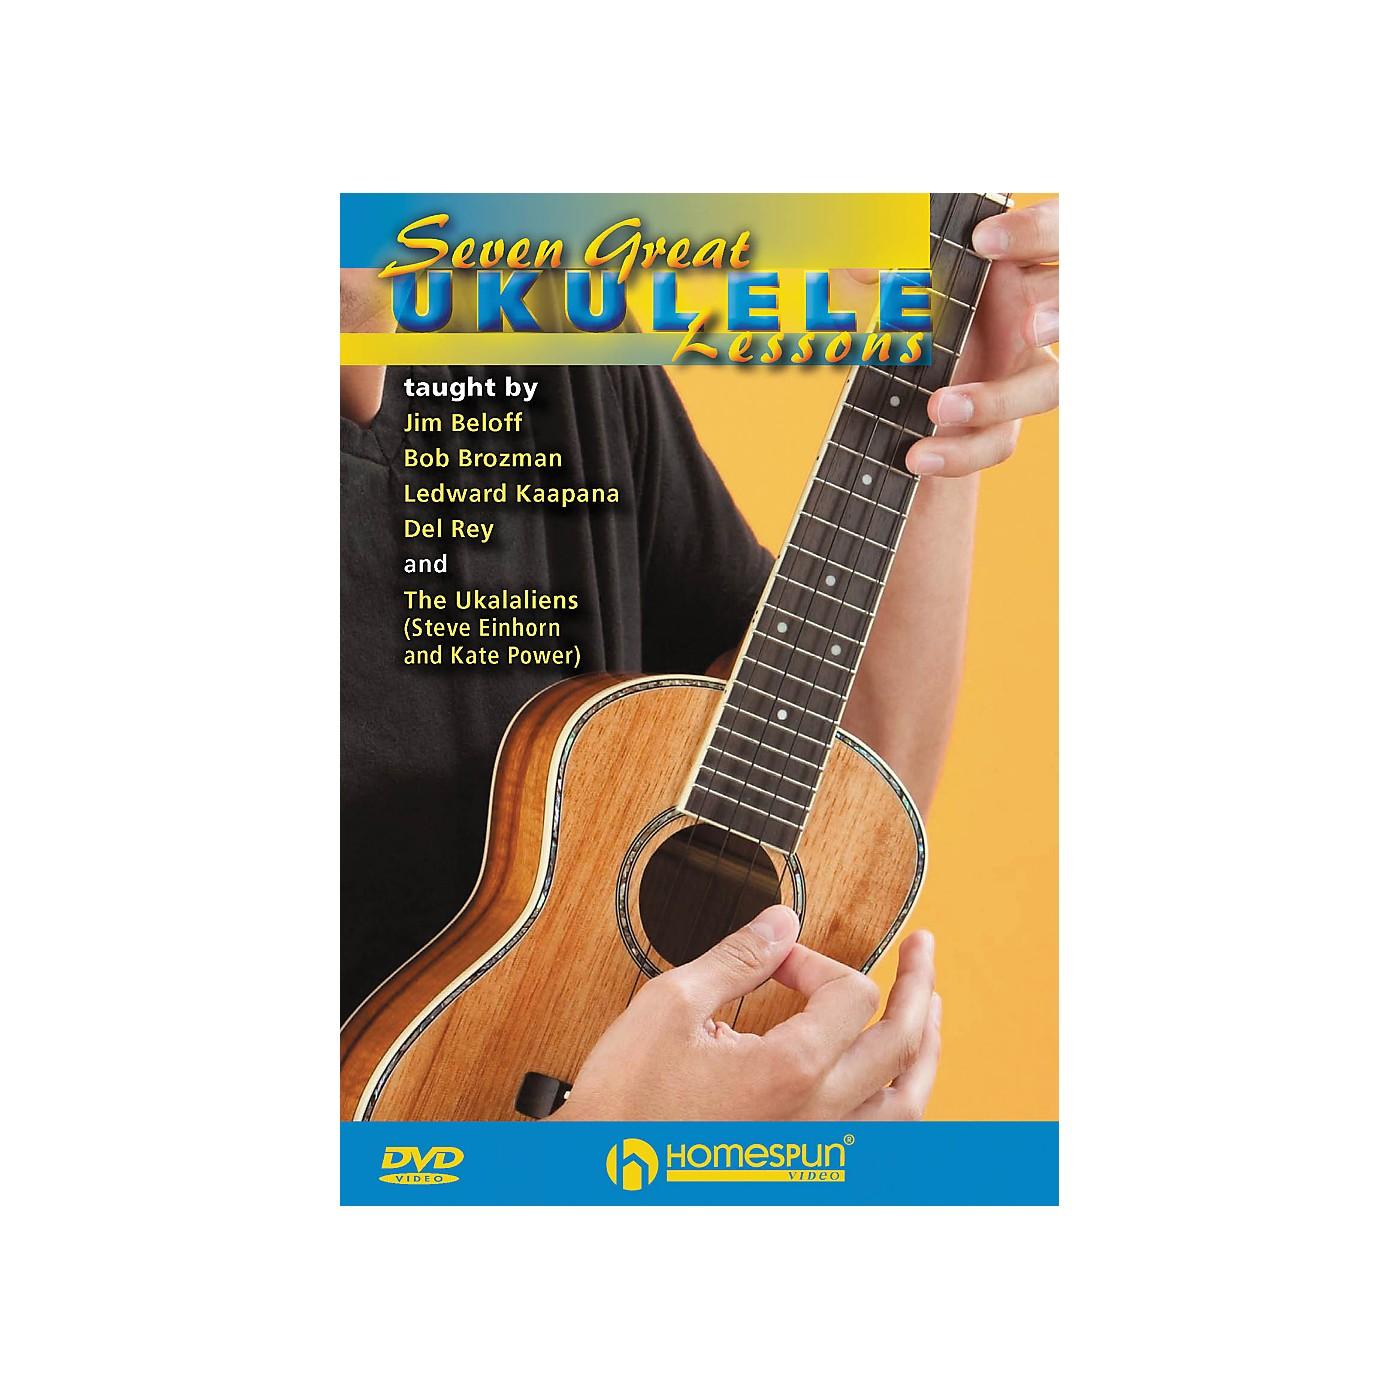 Homespun Seven Great Ukulele Lessons DVD thumbnail